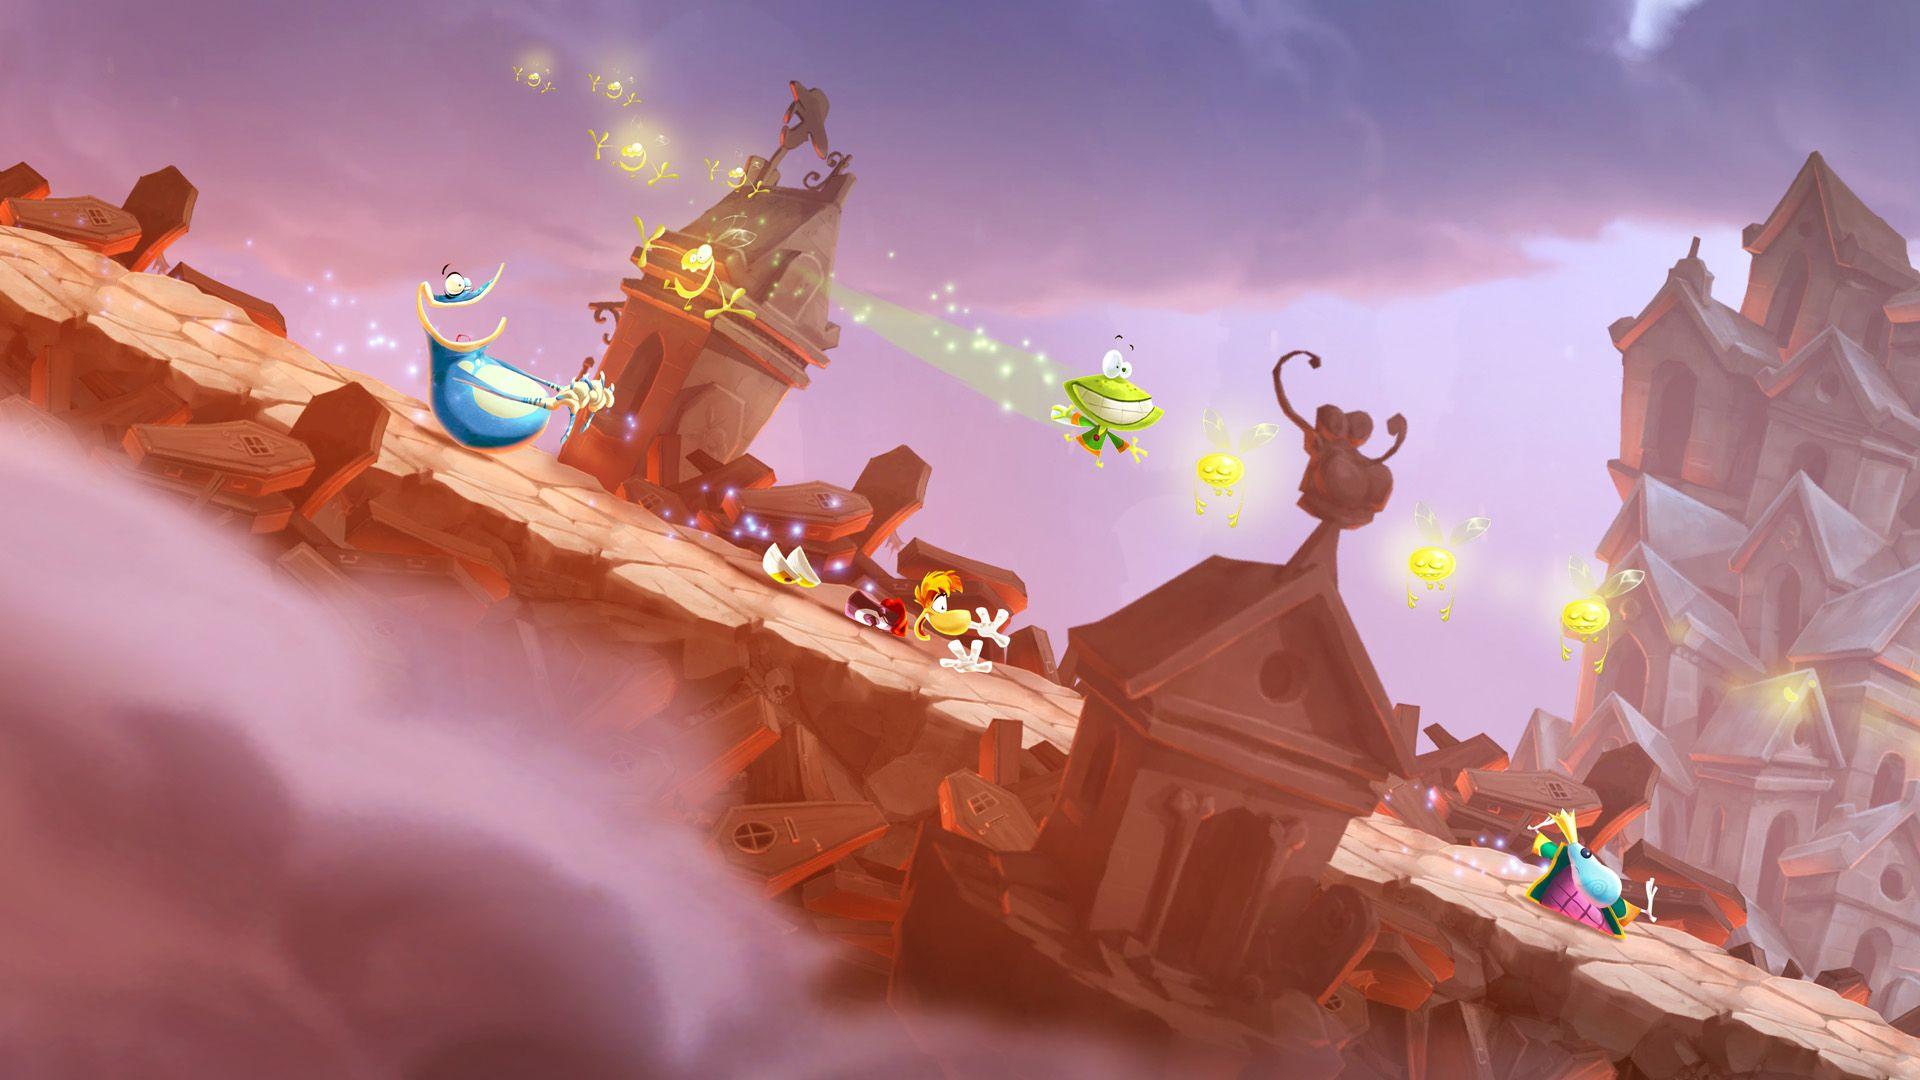 Rayman-Legends-4.jpg (1920×1080)